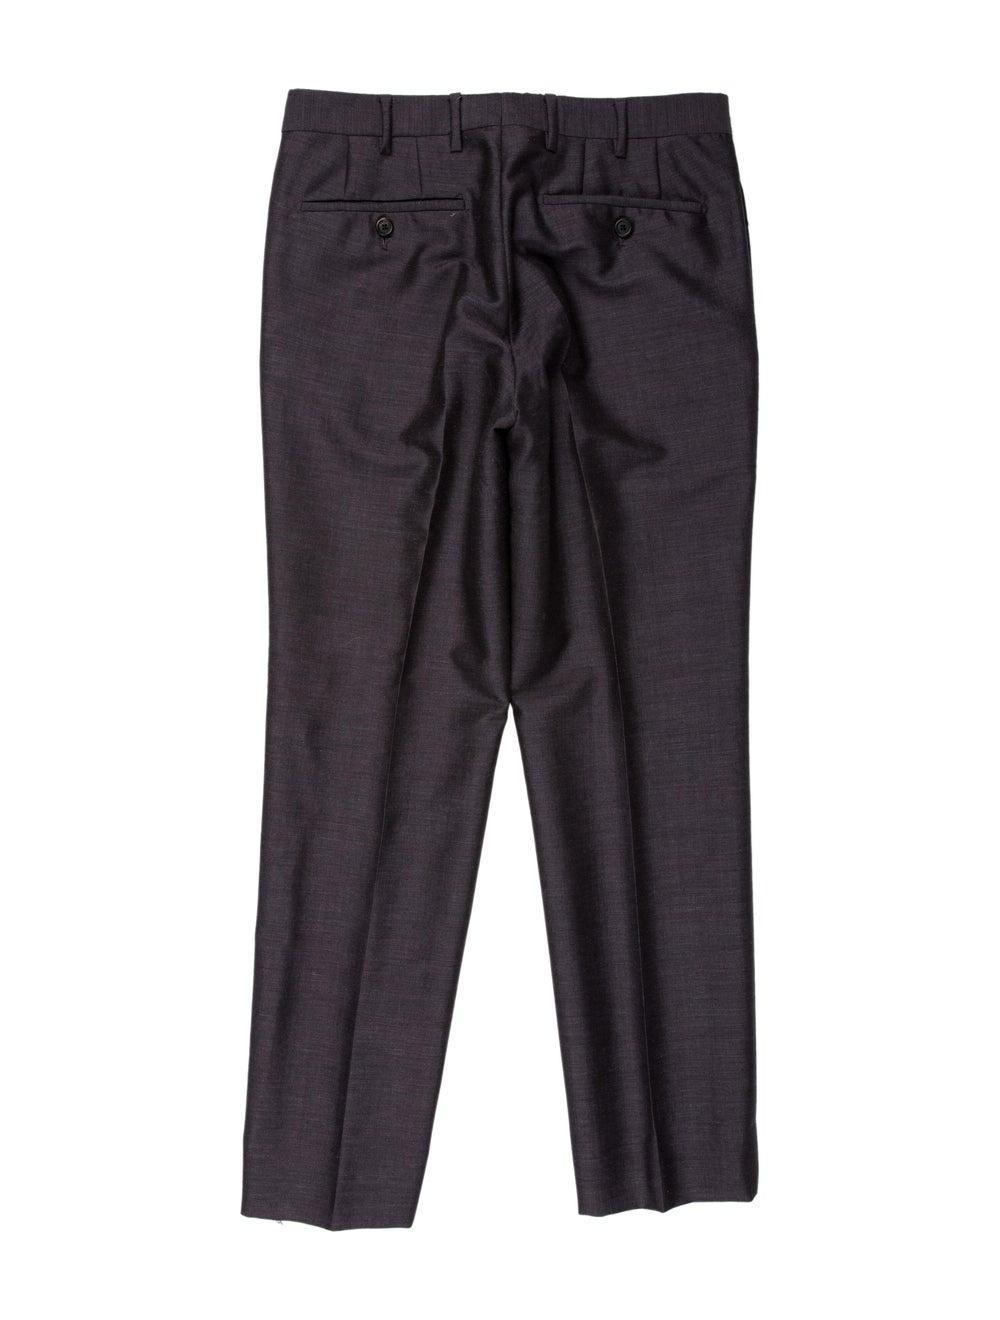 Prada Mohair Two-Piece Suit Grey - image 4